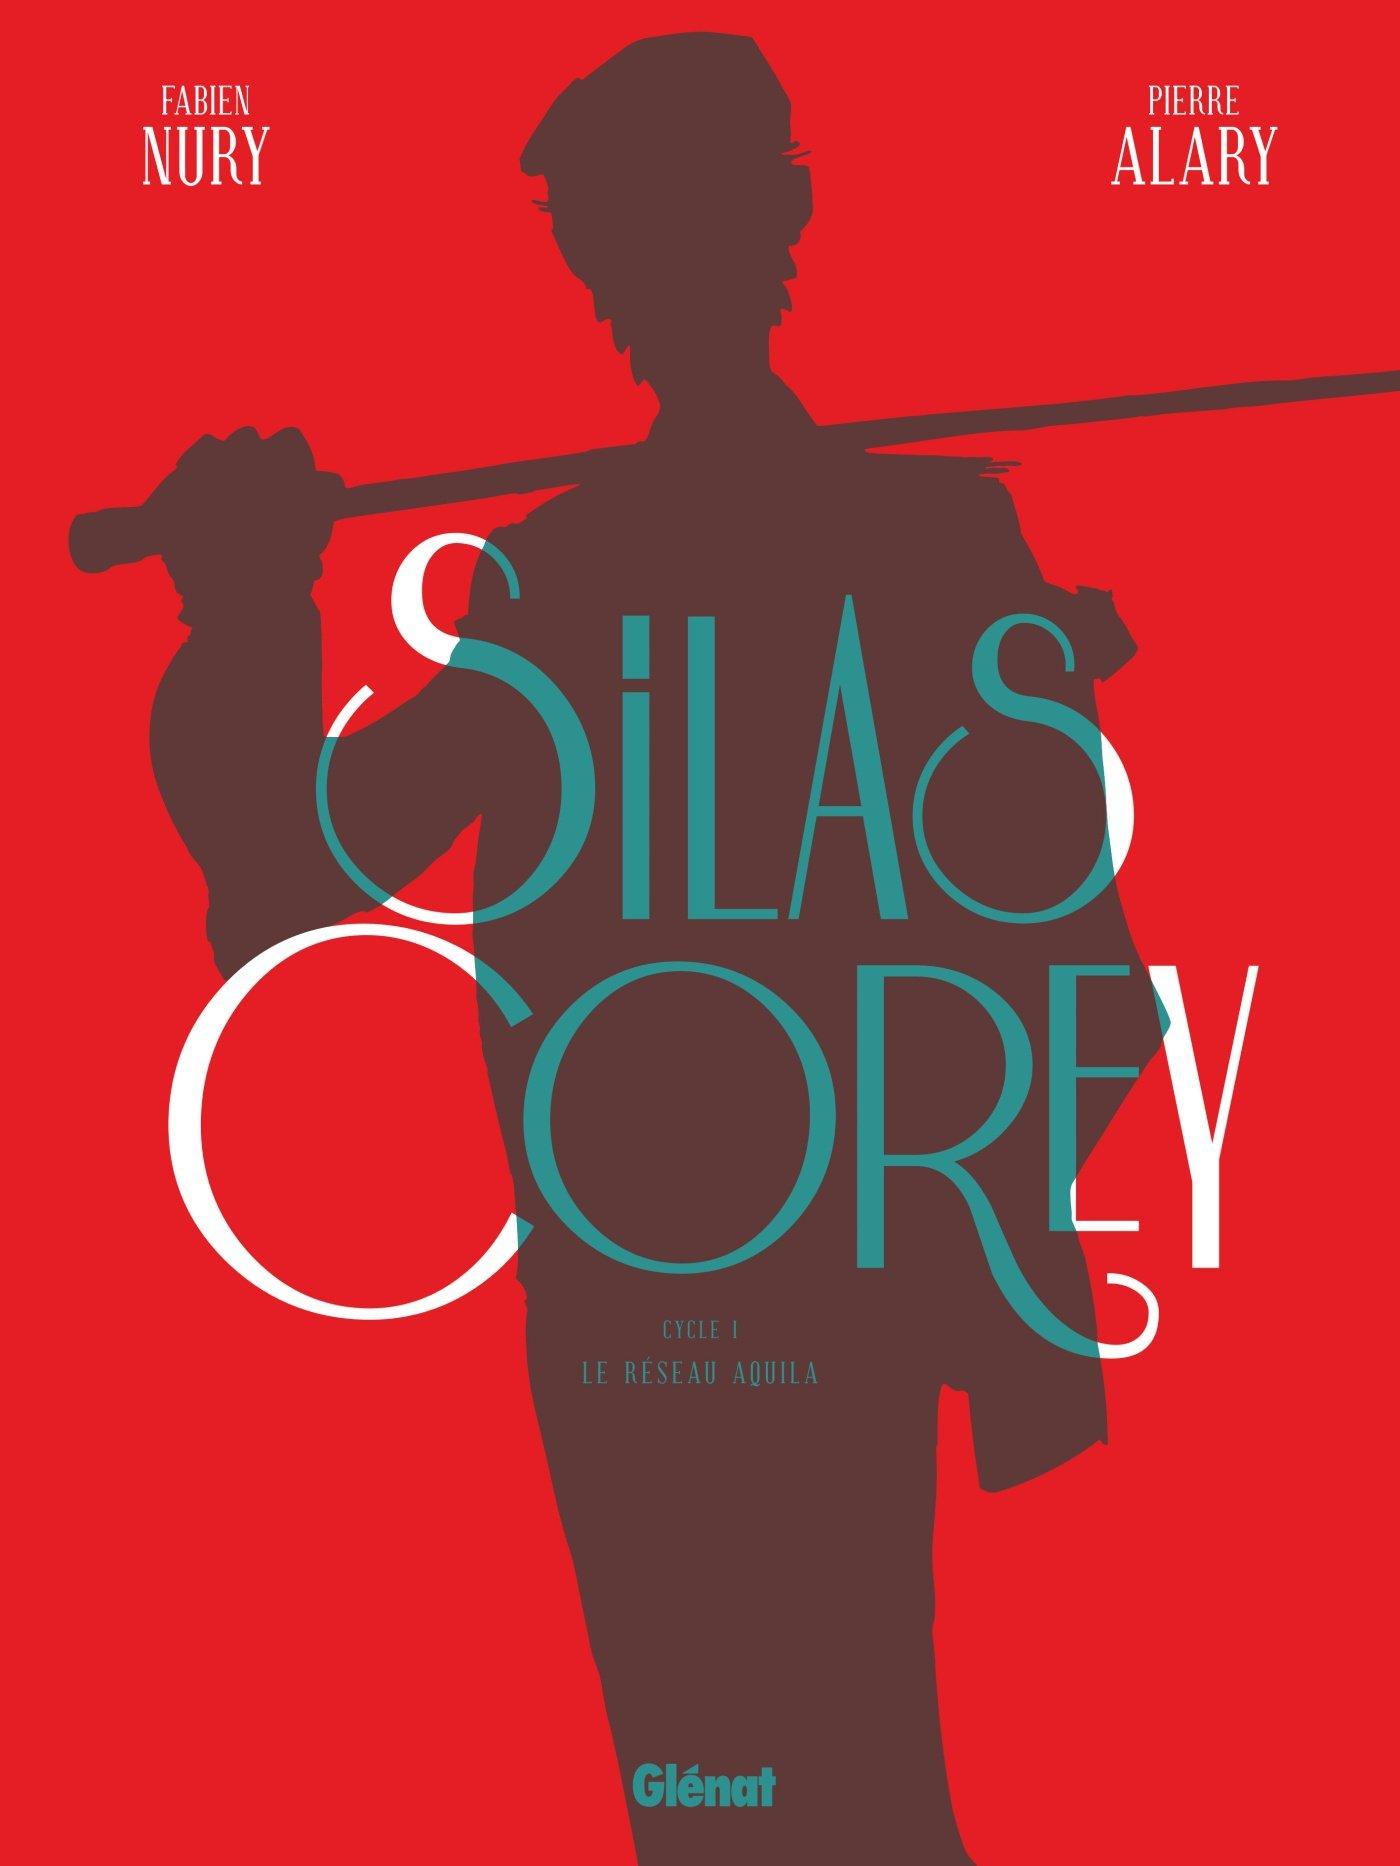 Silas Corey - Intégrale Cycle 1 Album – 22 novembre 2017 Fabien Nury Pierre Alary Glénat BD 2344025138